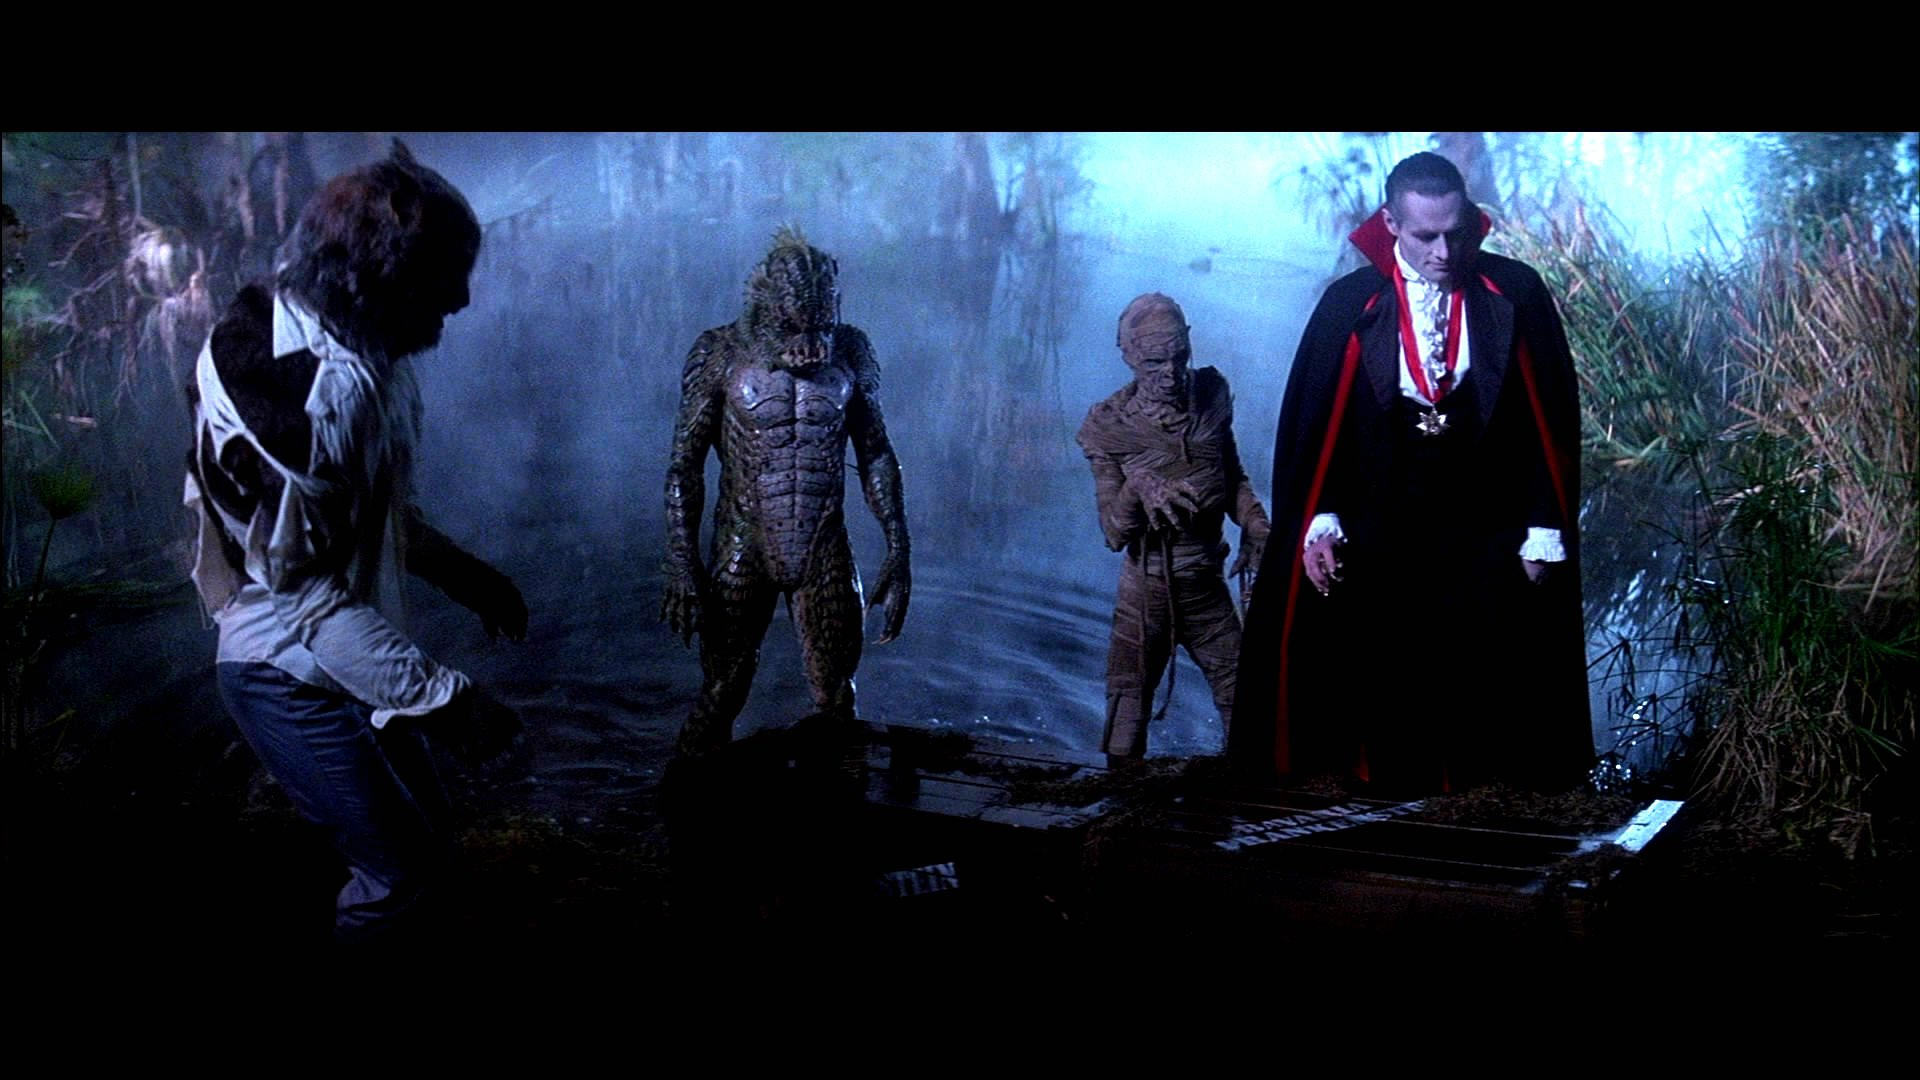 MONSTER SQUAD action comedy fantasy horror dark vampire frankenstein halloween wallpaper | 1920x1080 | 274377 | WallpaperUP